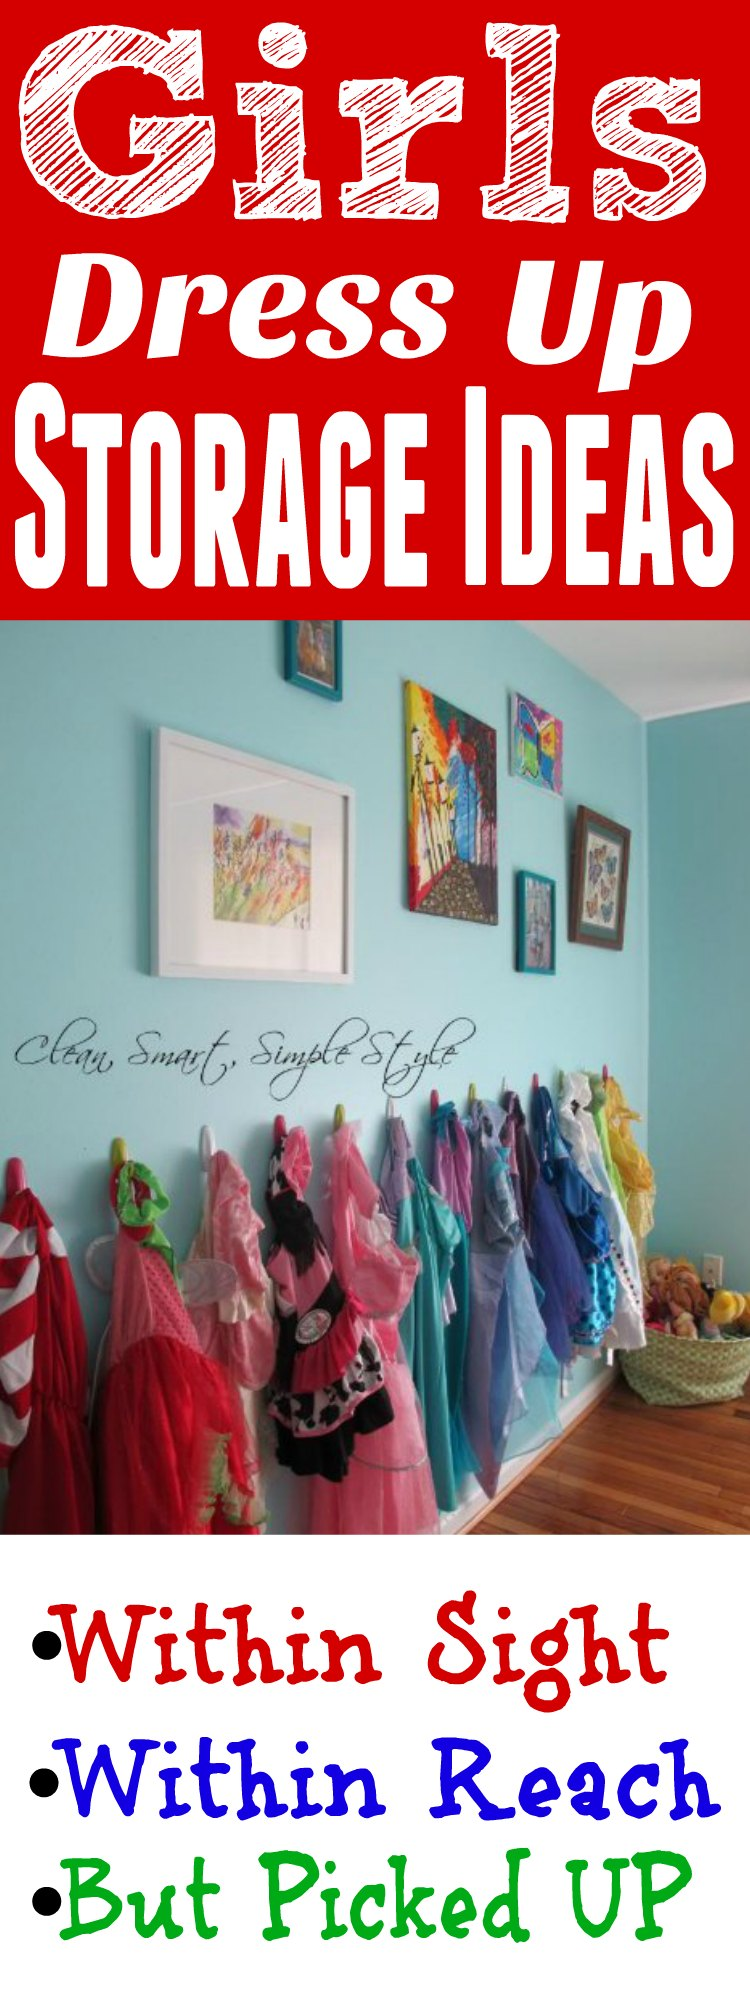 Girls Dress Up Storage Ideas